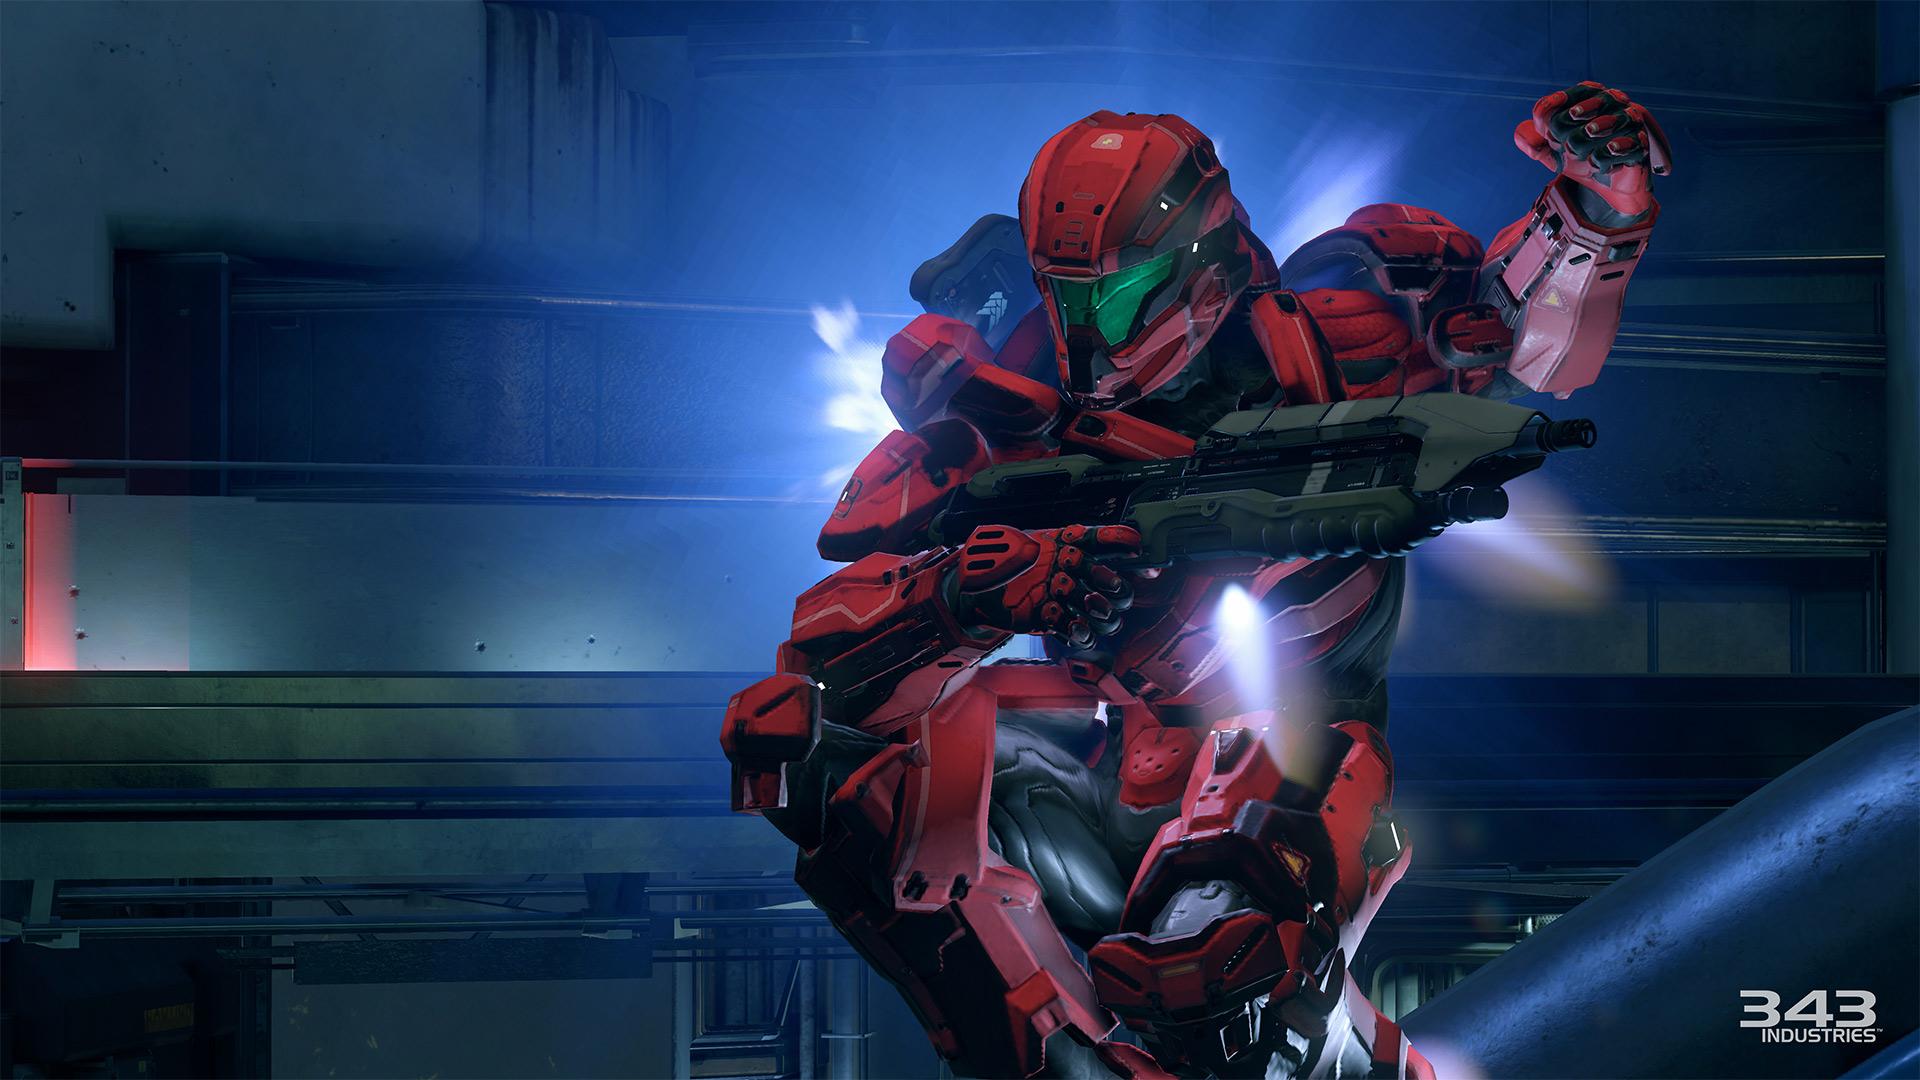 Halo 5 Guardians Multiplayer Beta Impressions 1920x1080